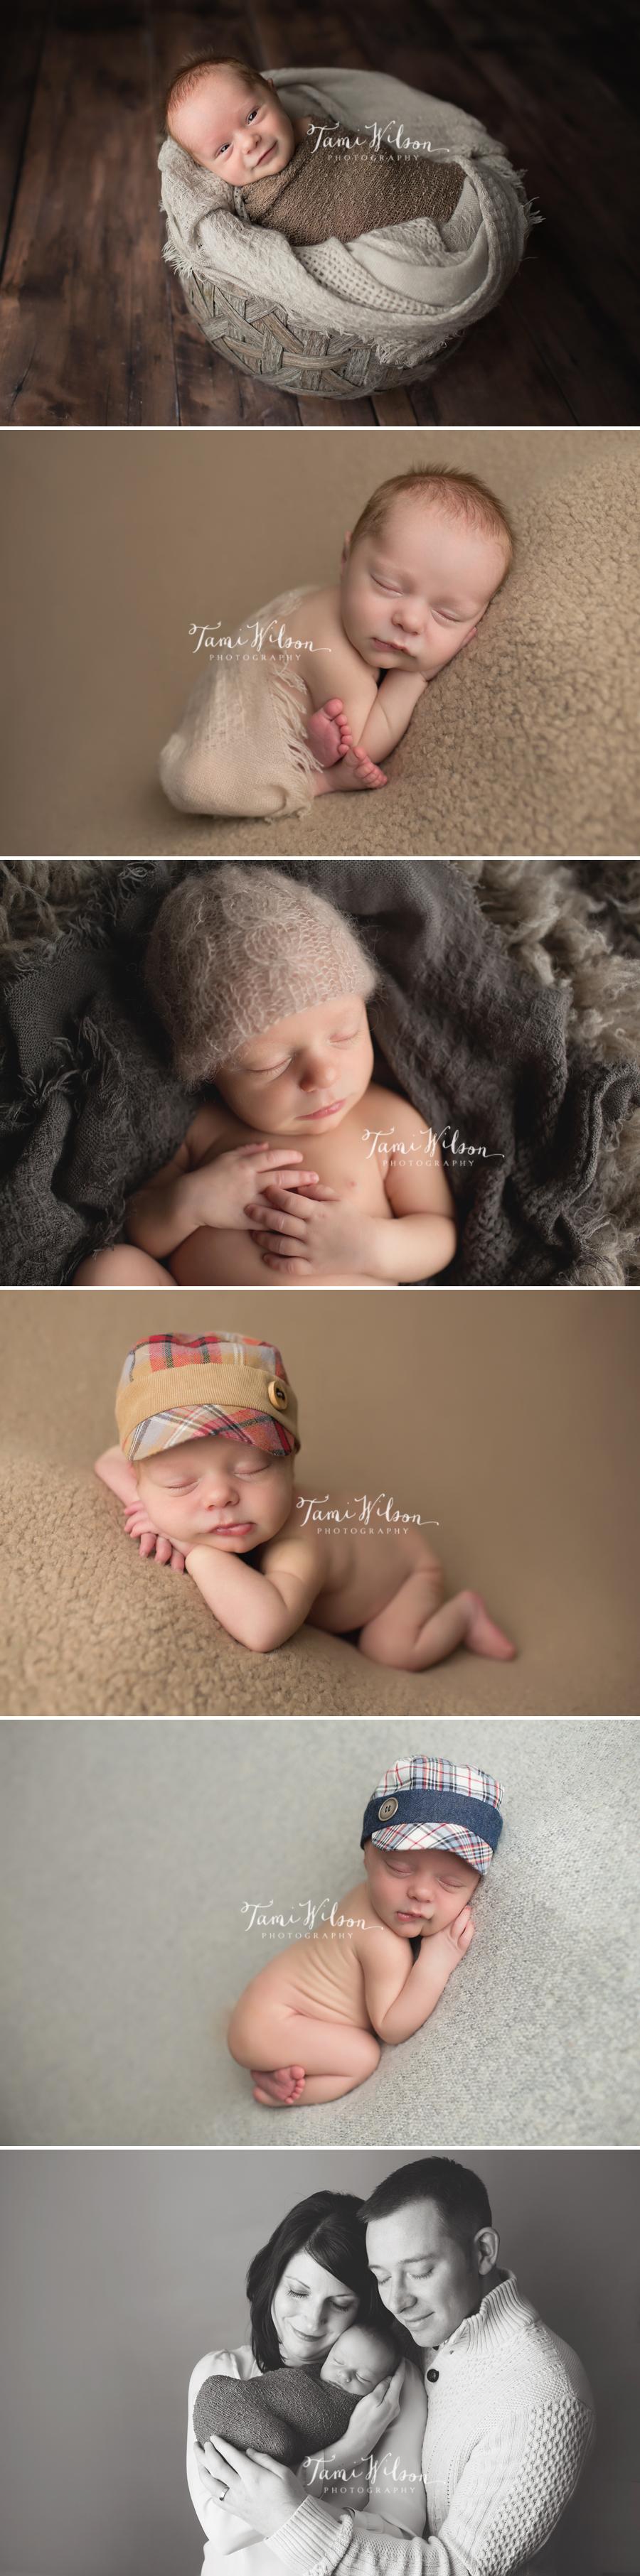 Baby declan denver newborn photographer https www amazon co